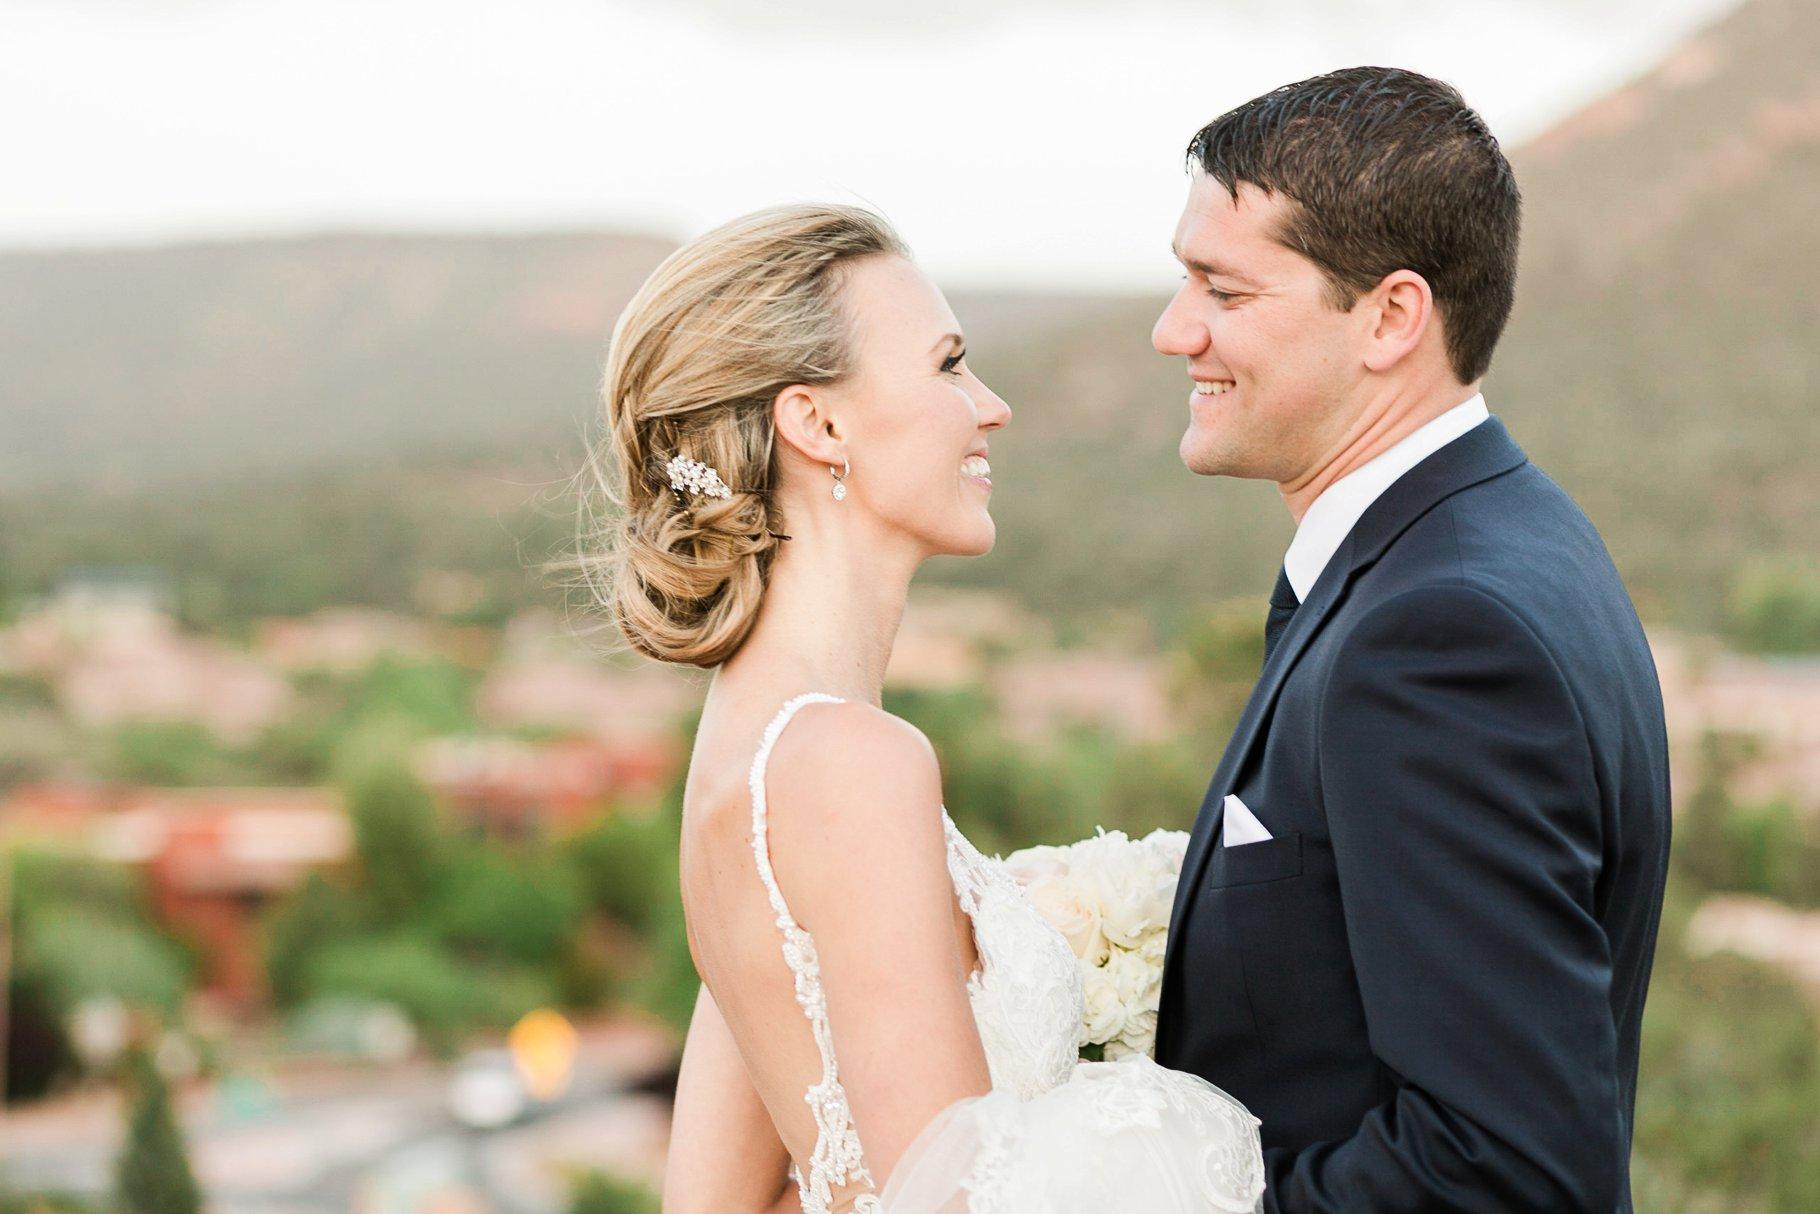 sedona wedding-120_GRETCHEN WAKEMAN PHOTOGRAPHY.jpg